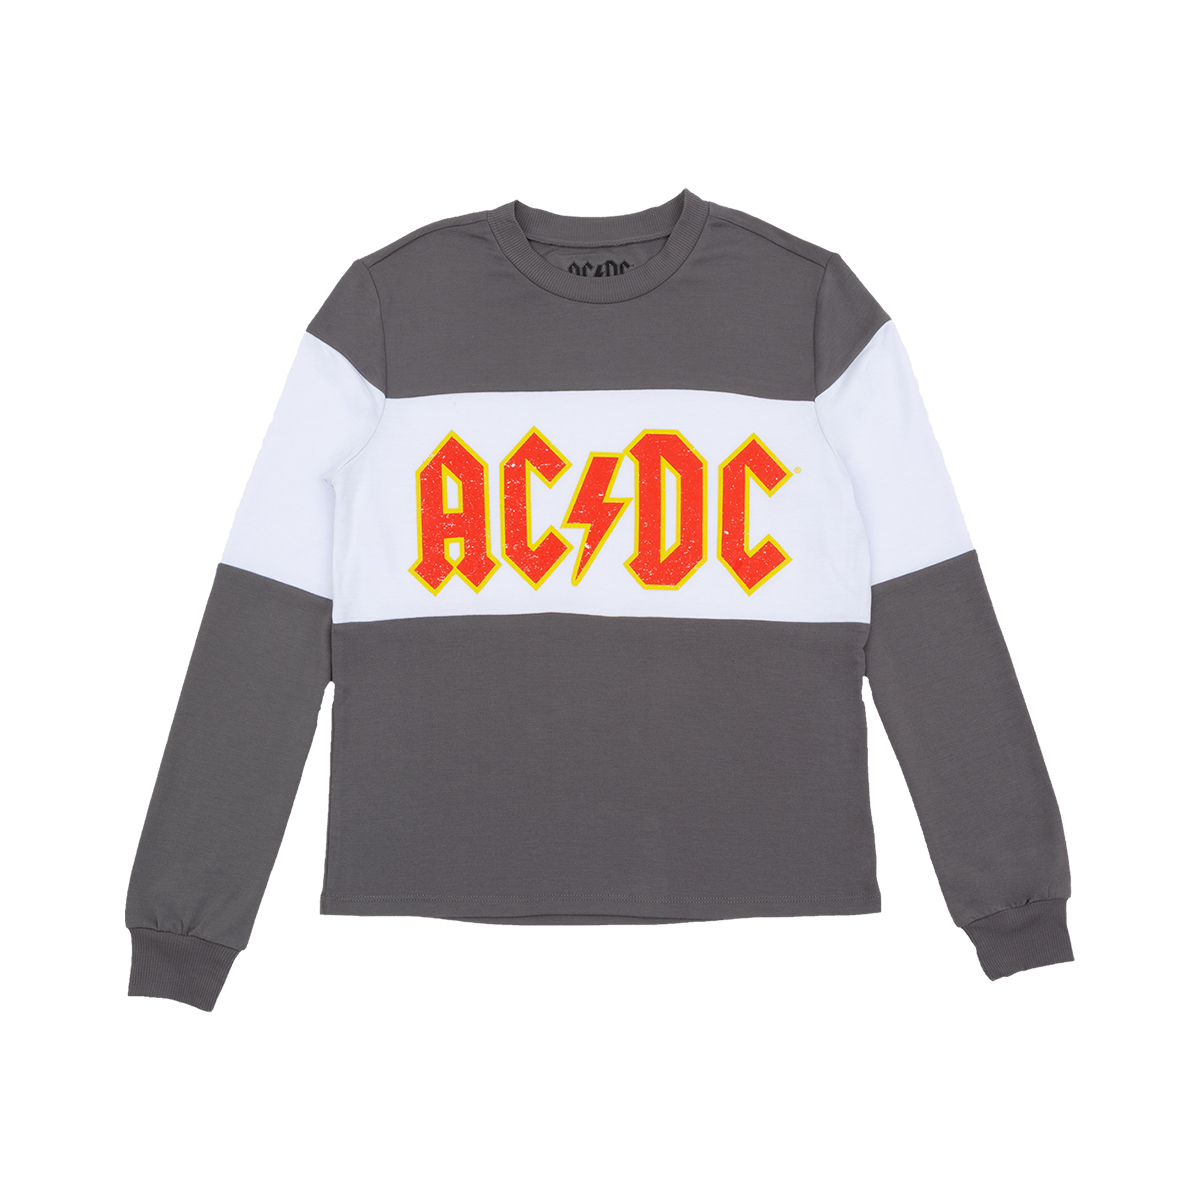 AC/DC Longsleeve Crew Neck T-shirt